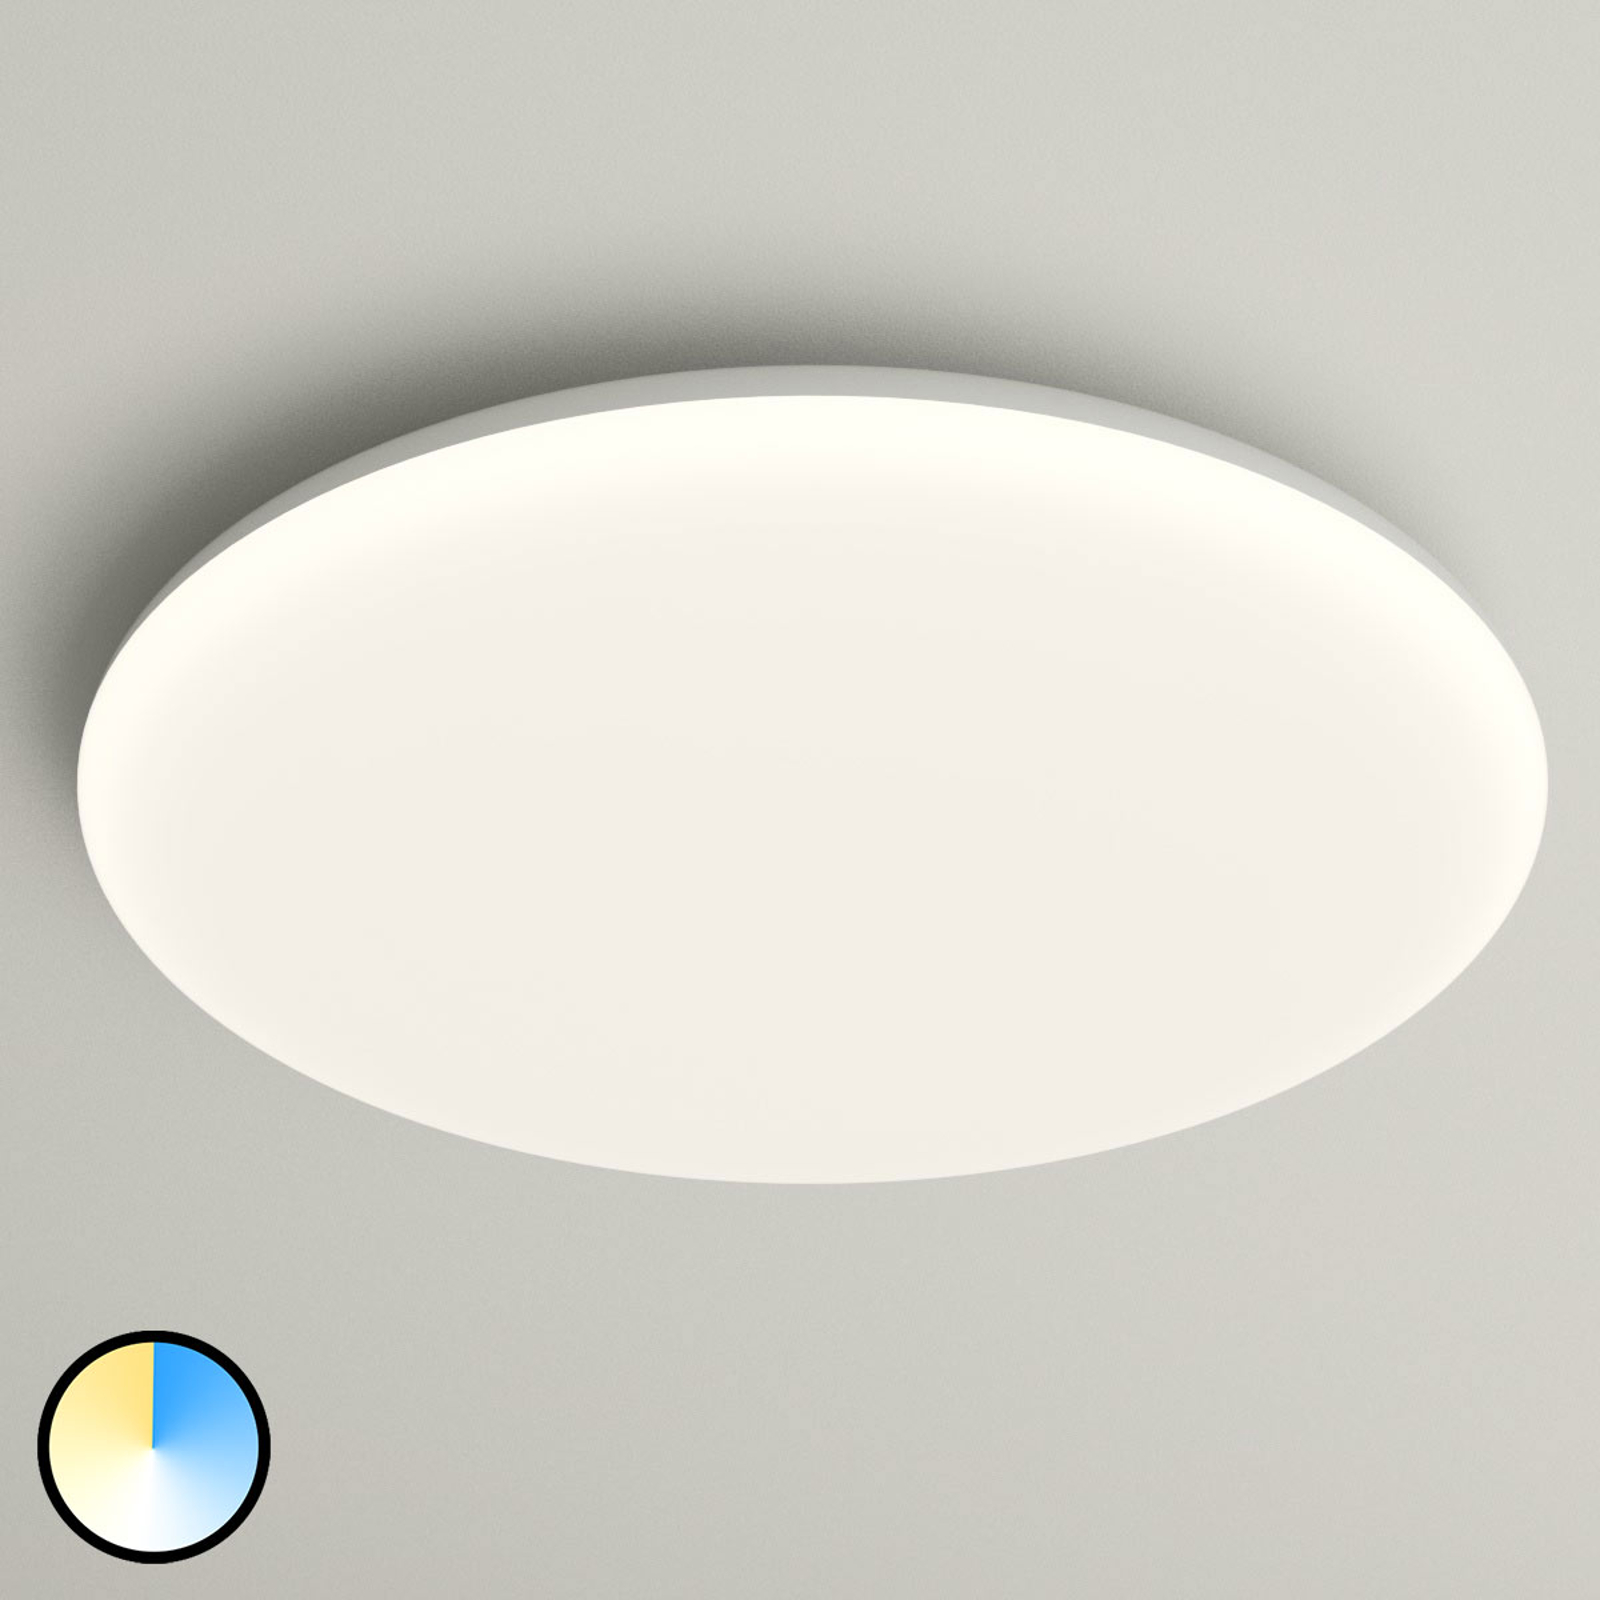 LED plafondlamp Azra, wit, rond, IP54, Ø 40 cm